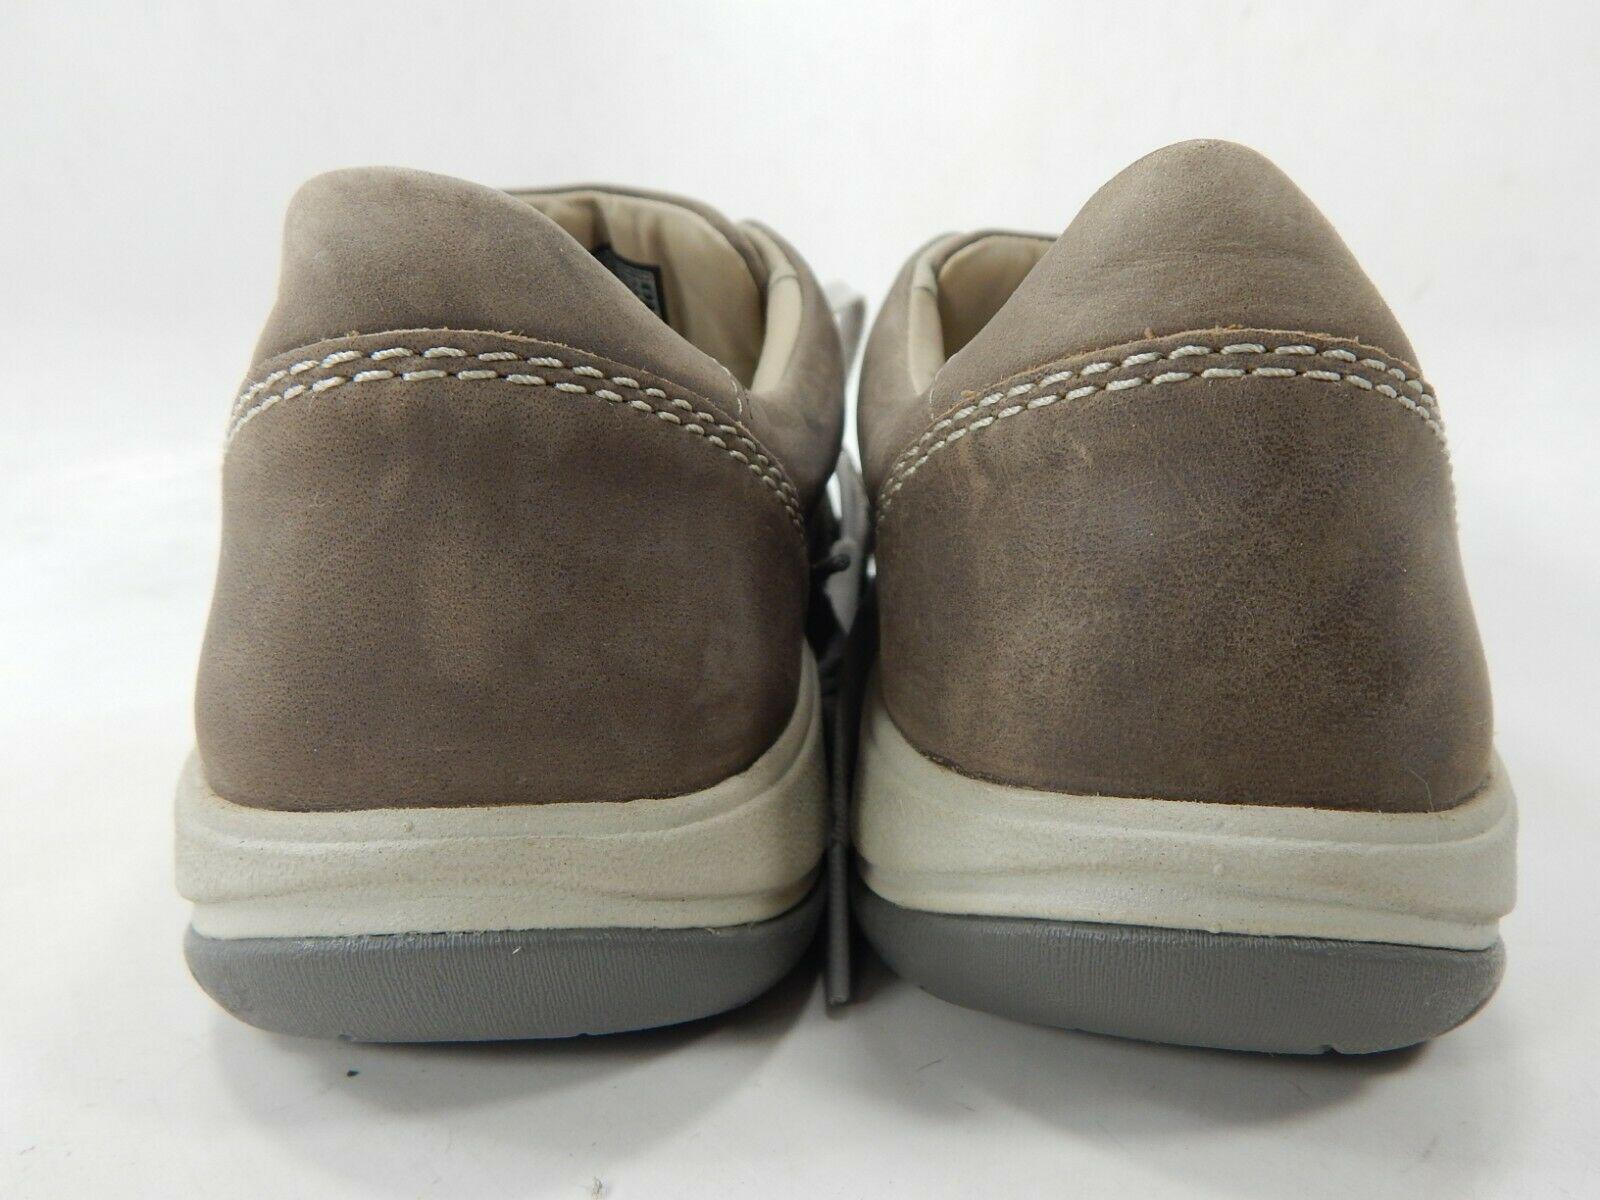 Keen Presidio II Misura 7 M (B) Eu 37.5 Donna Casual Oxford Shoes Paloma 1018316 image 6